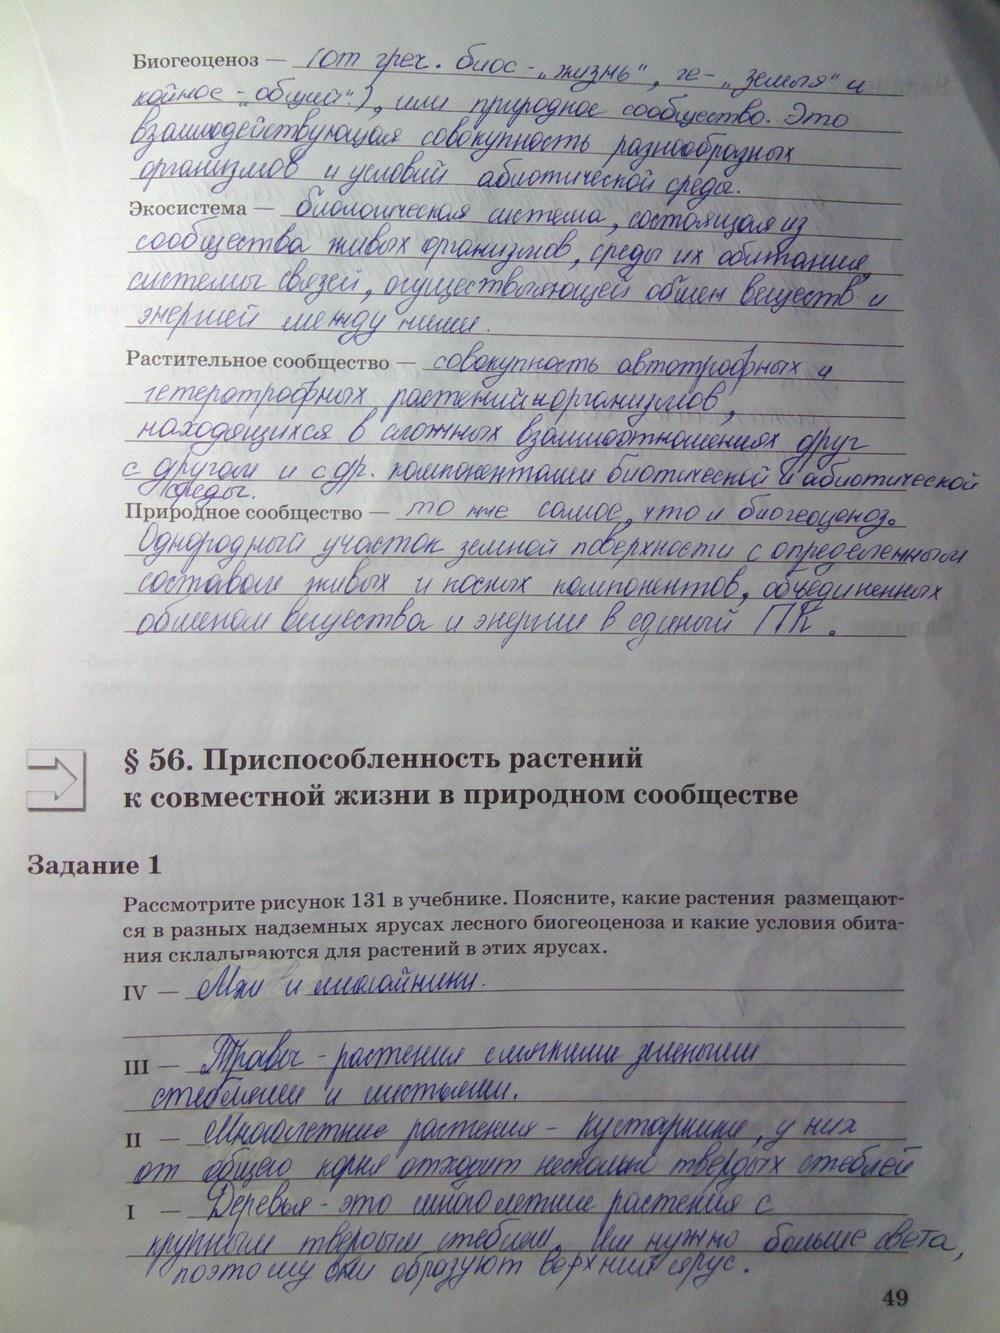 Решебник К Учебнику Биология 6 Класс Пономарева Корнилова Кучменко